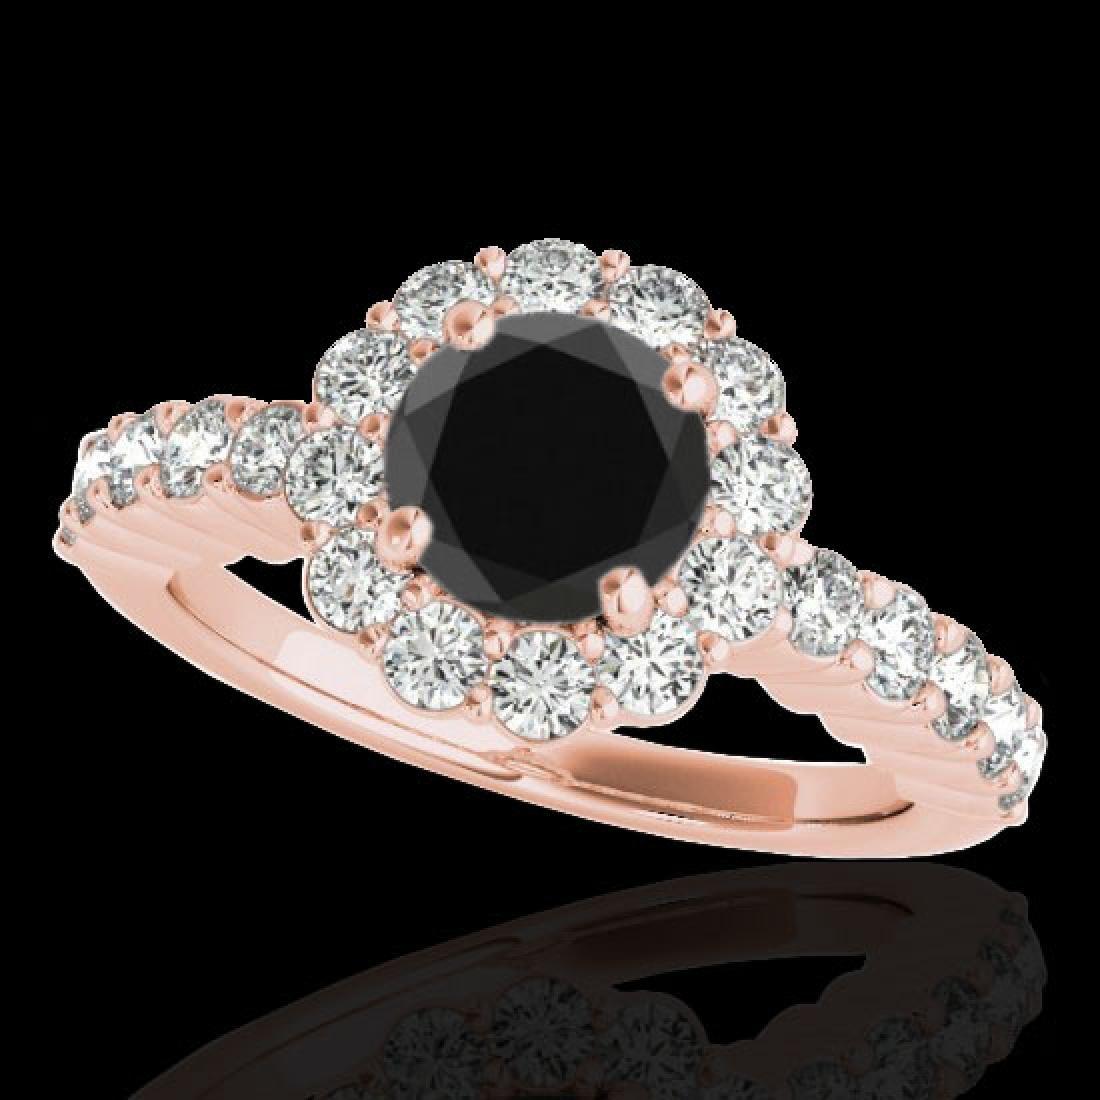 1.75 CTW Certified VS Black Diamond Solitaire Halo Ring